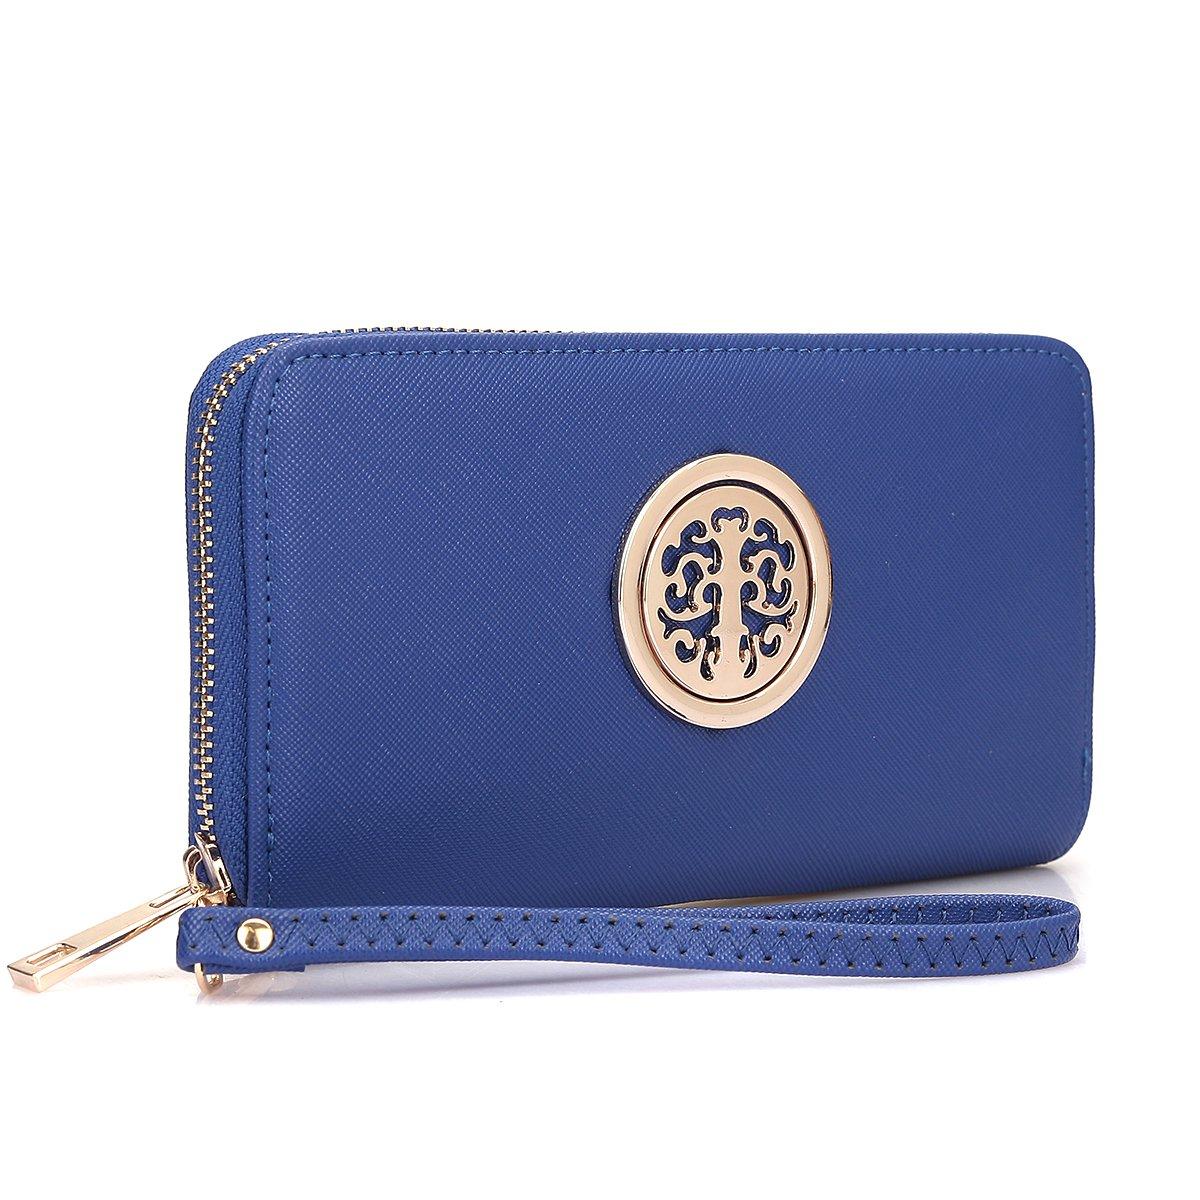 Women Long Wallet Lady Saffiano Leather Wristlet Purse Zipper Organizer Card Cellphone Holder Navy Blue